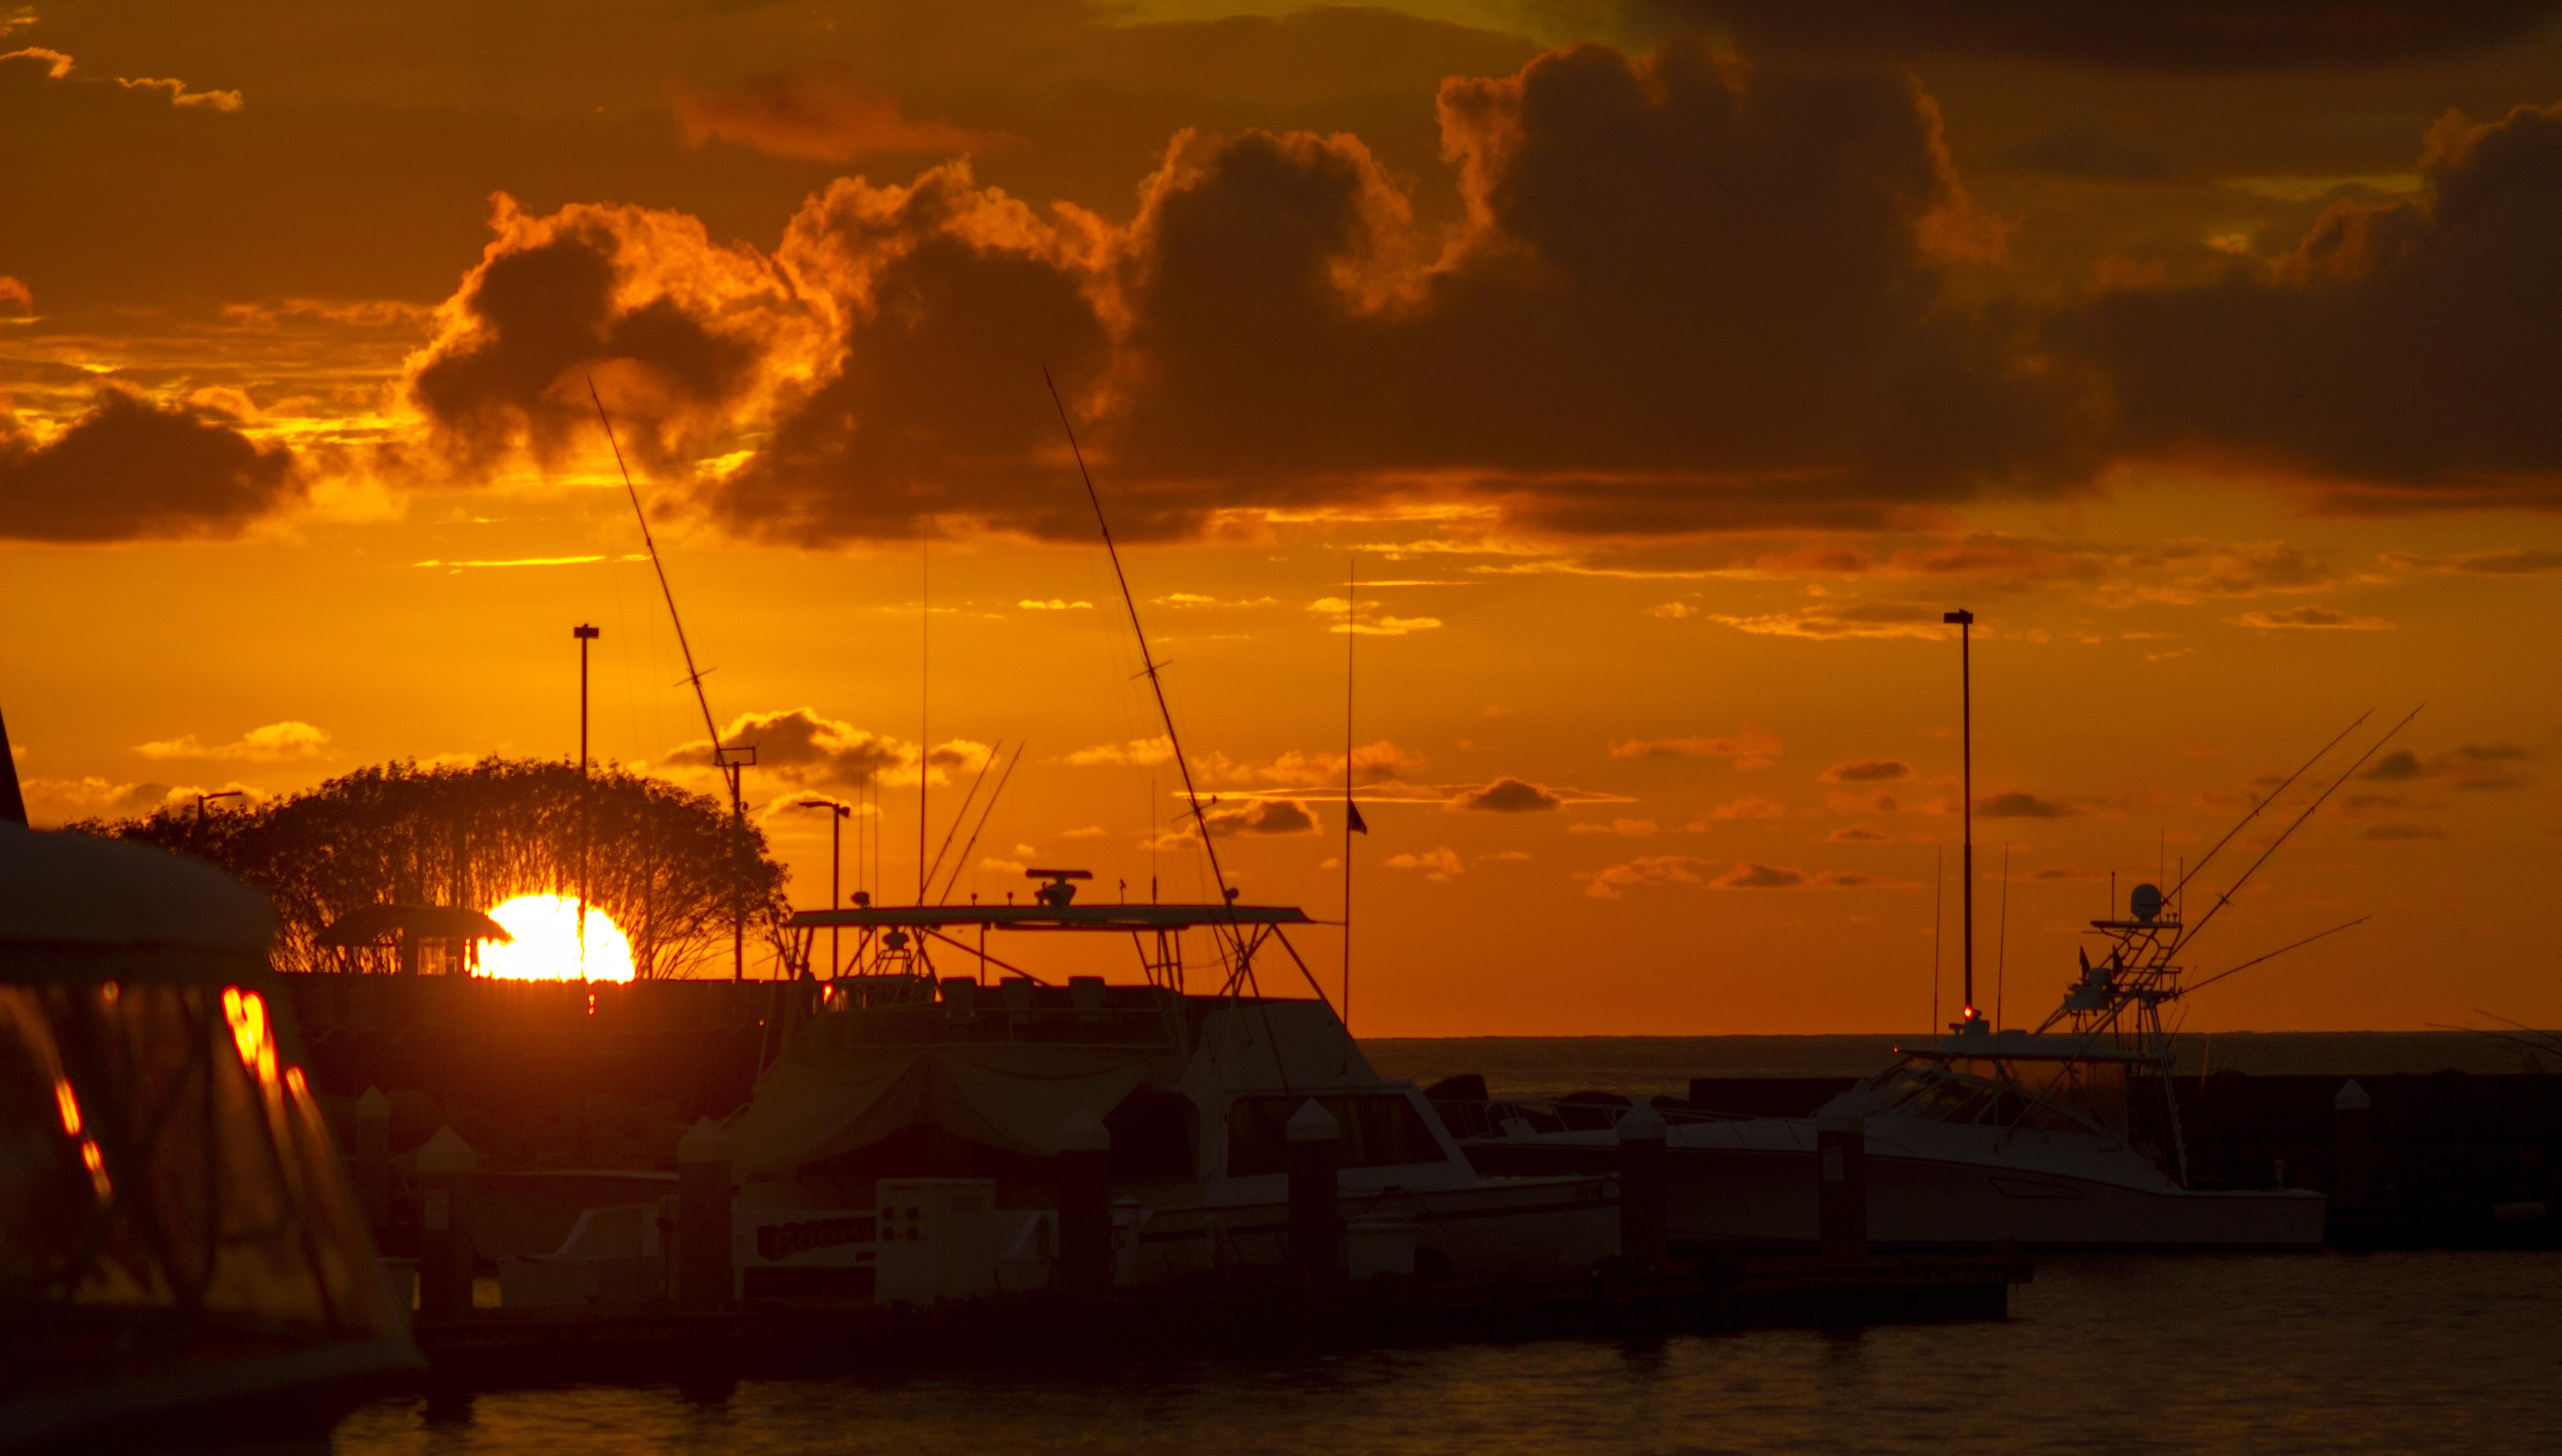 The amazing sunsets